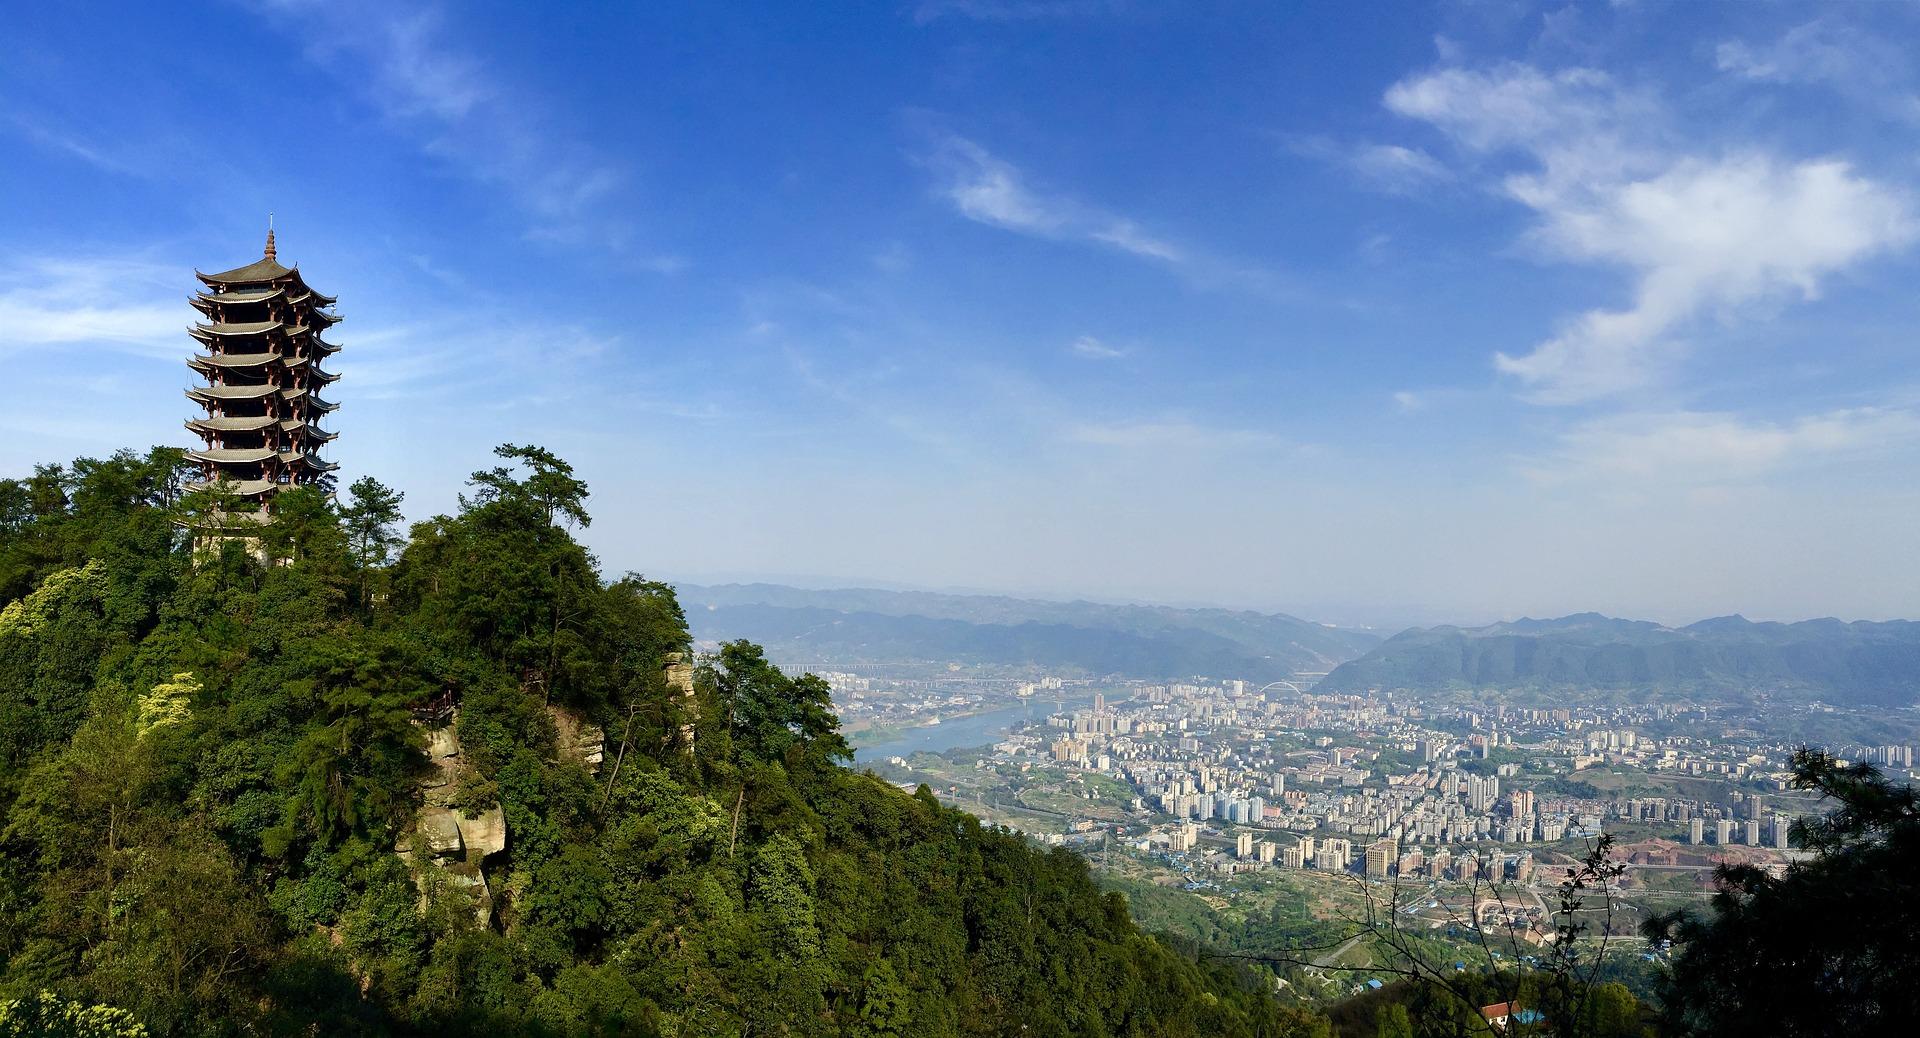 Natur um Chongqing